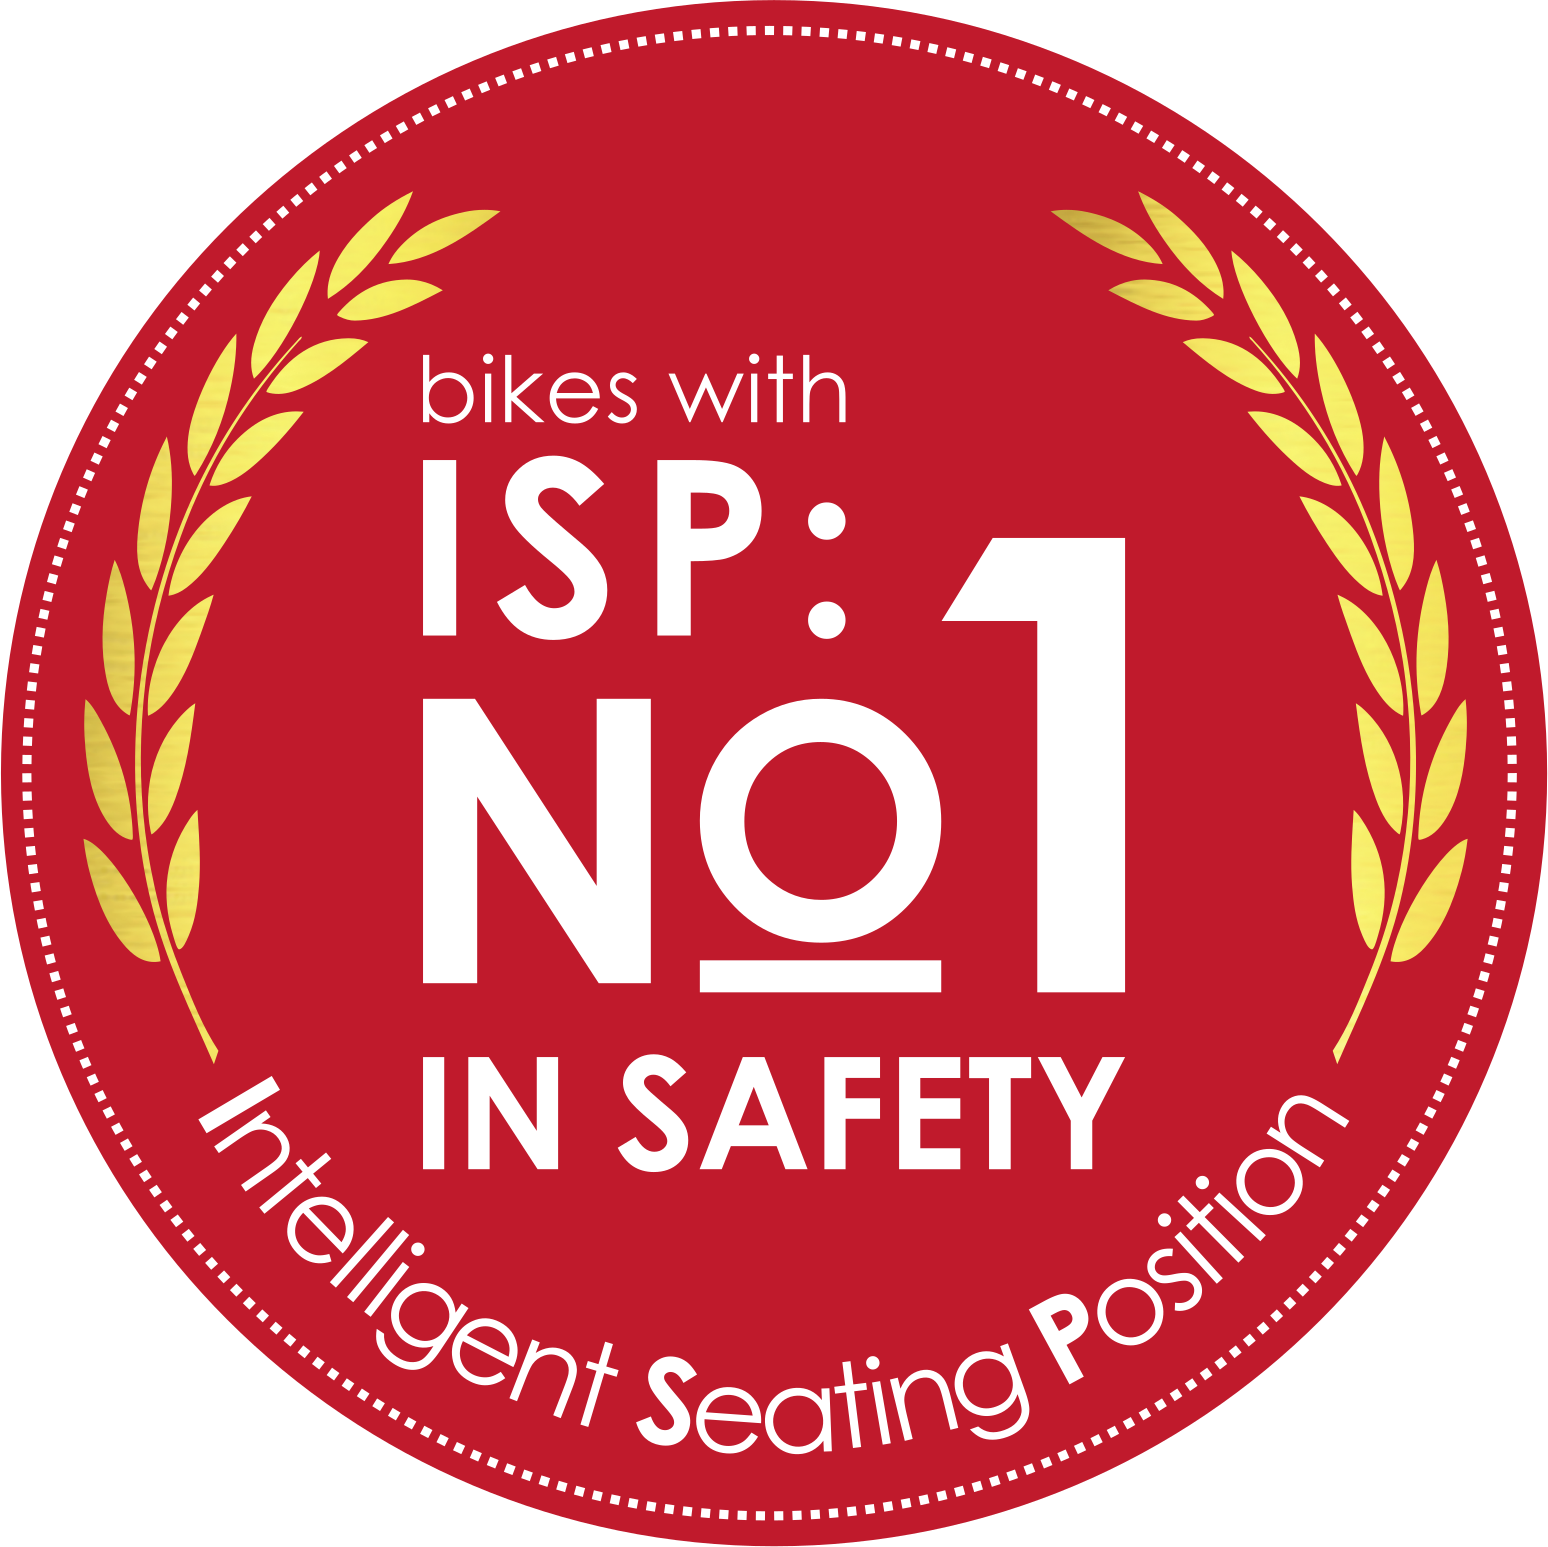 ISP: Number 1 in Safety